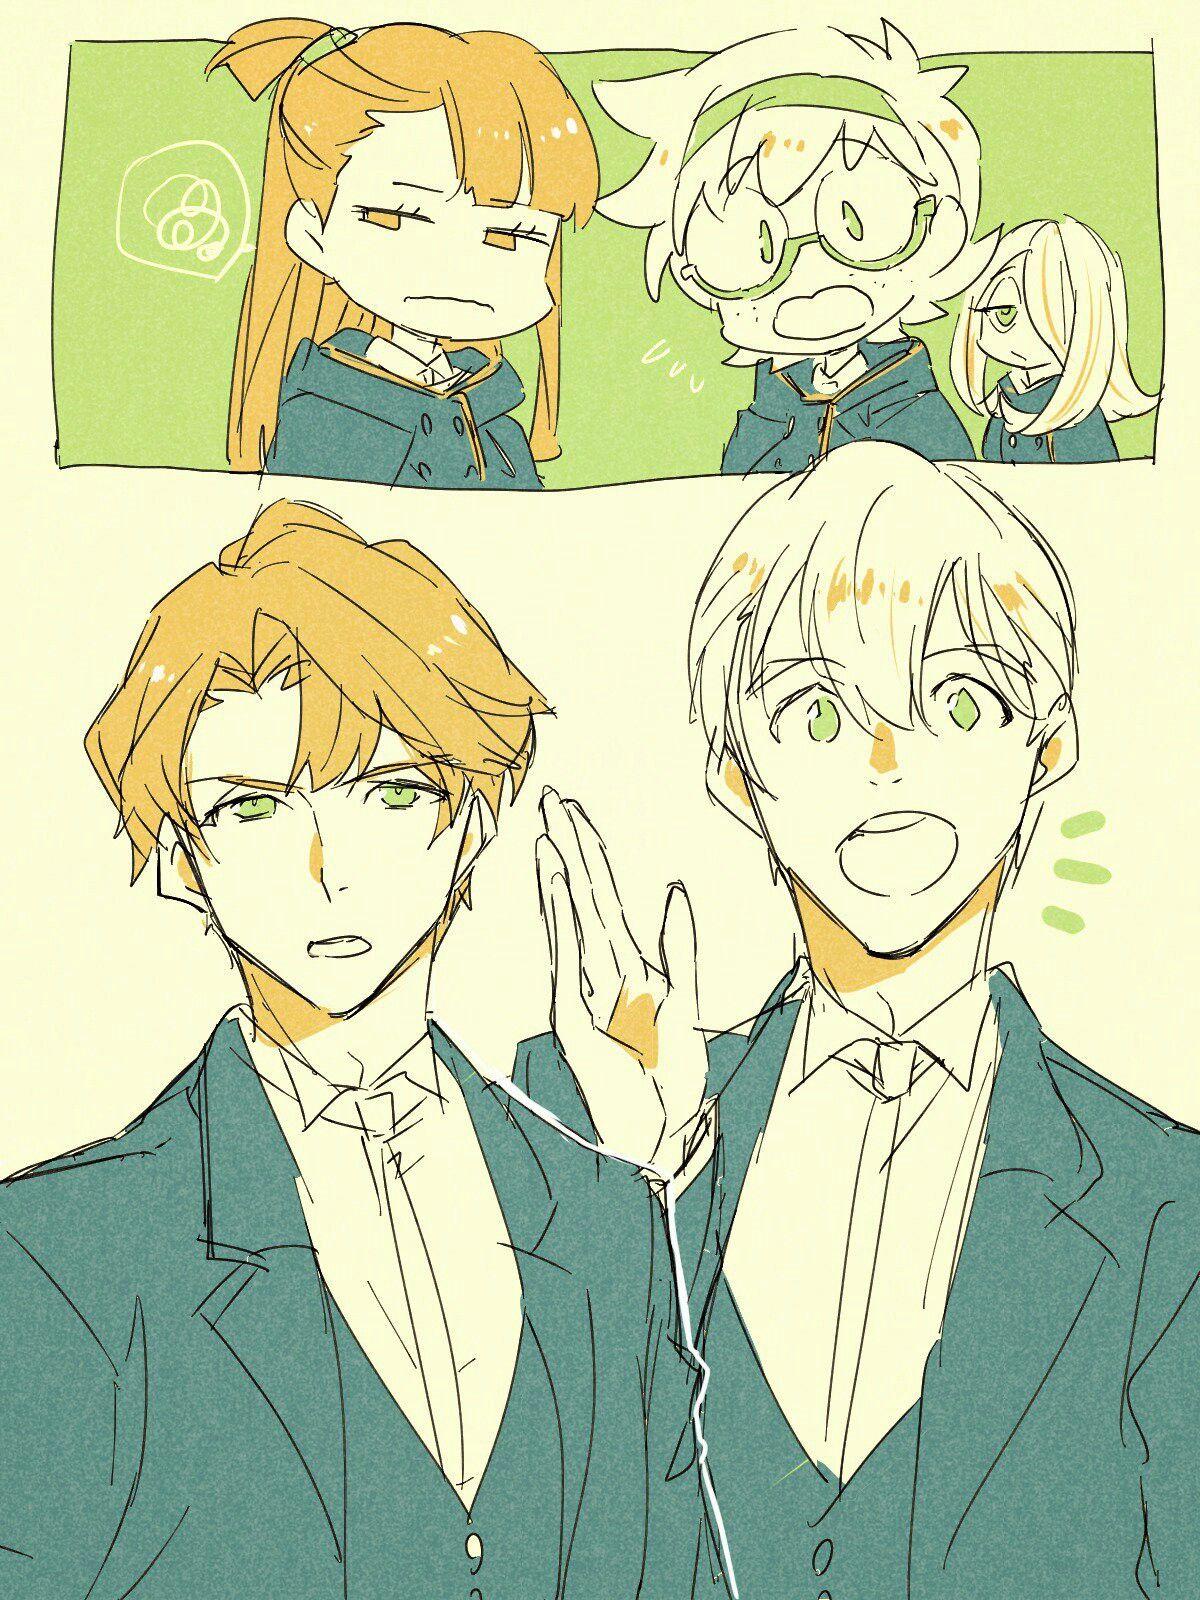 Dibujos Anime: Akko And Andrew Are So Cute